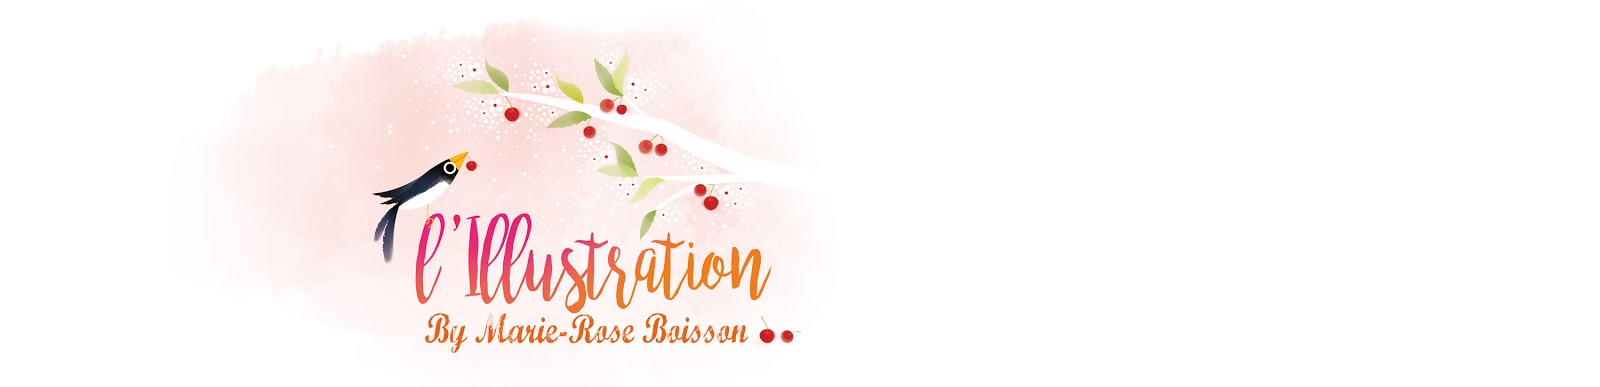 Marie-Rose Boisson - Illustratrice